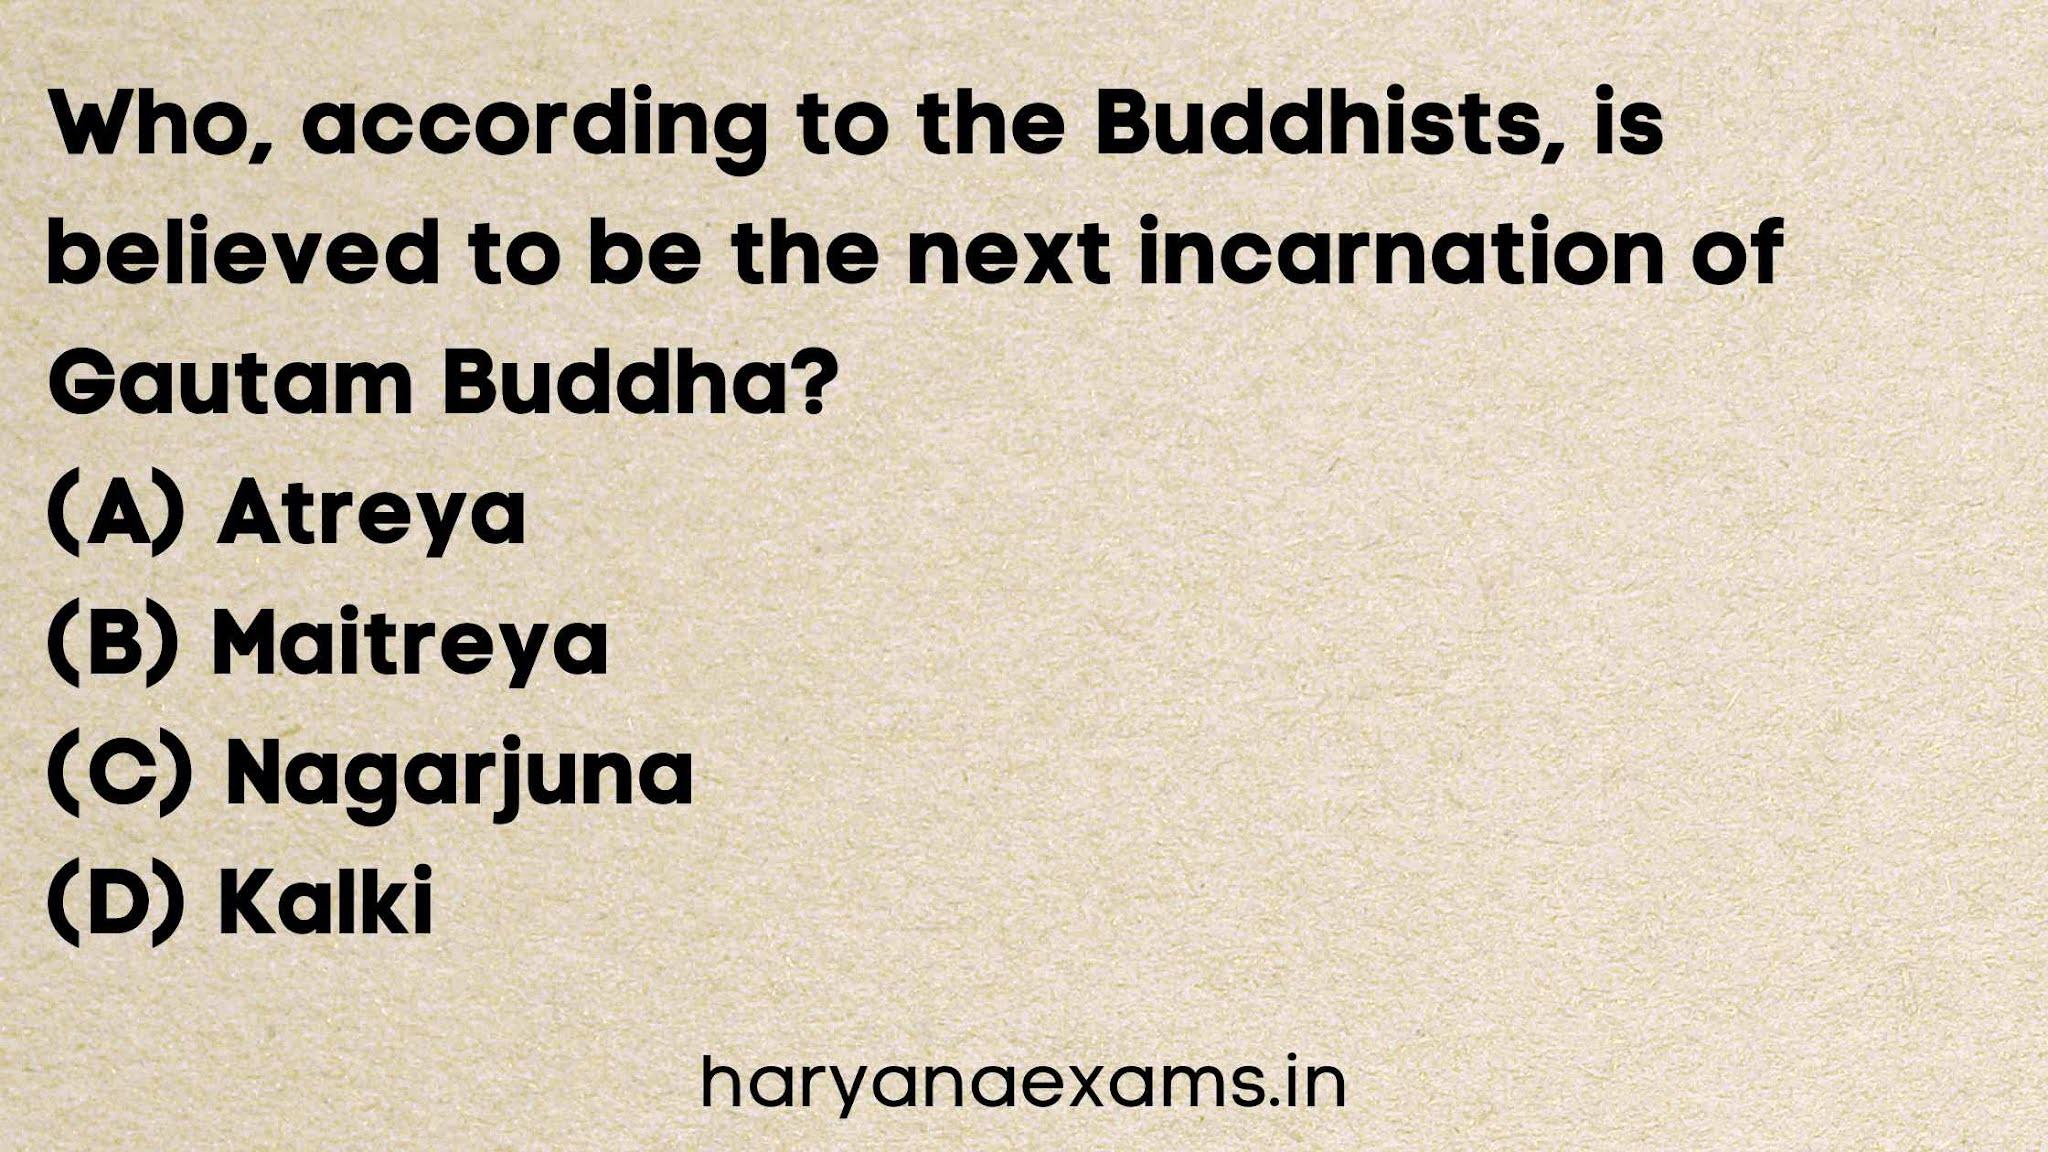 Who, according to the Buddhists, is believed to be the next incarnation of Gautam Buddha?   (A) Atreya   (B) Maitreya   (C) Nagarjuna   (D) Kalki